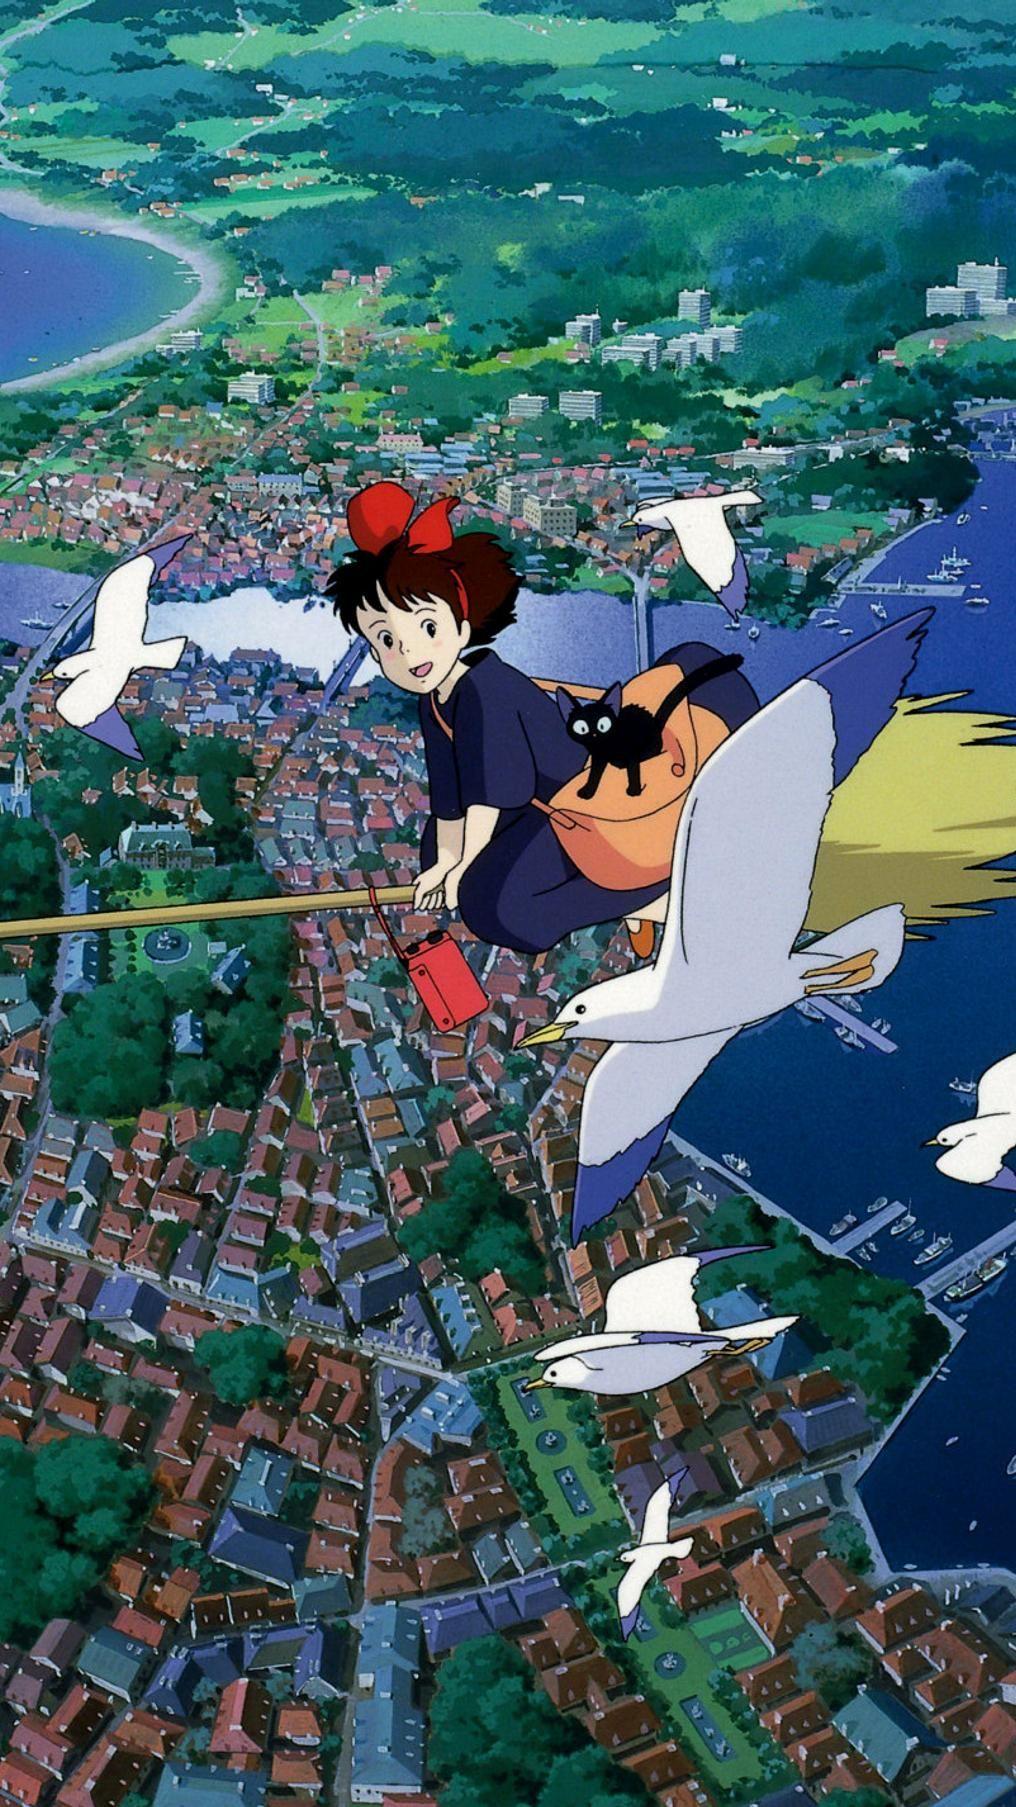 Moviemania Textless High Resolution Movie Wallpapers Studio Ghibli Background Studio Ghibli Art Ghibli Artwork Anime movie art wallpaper